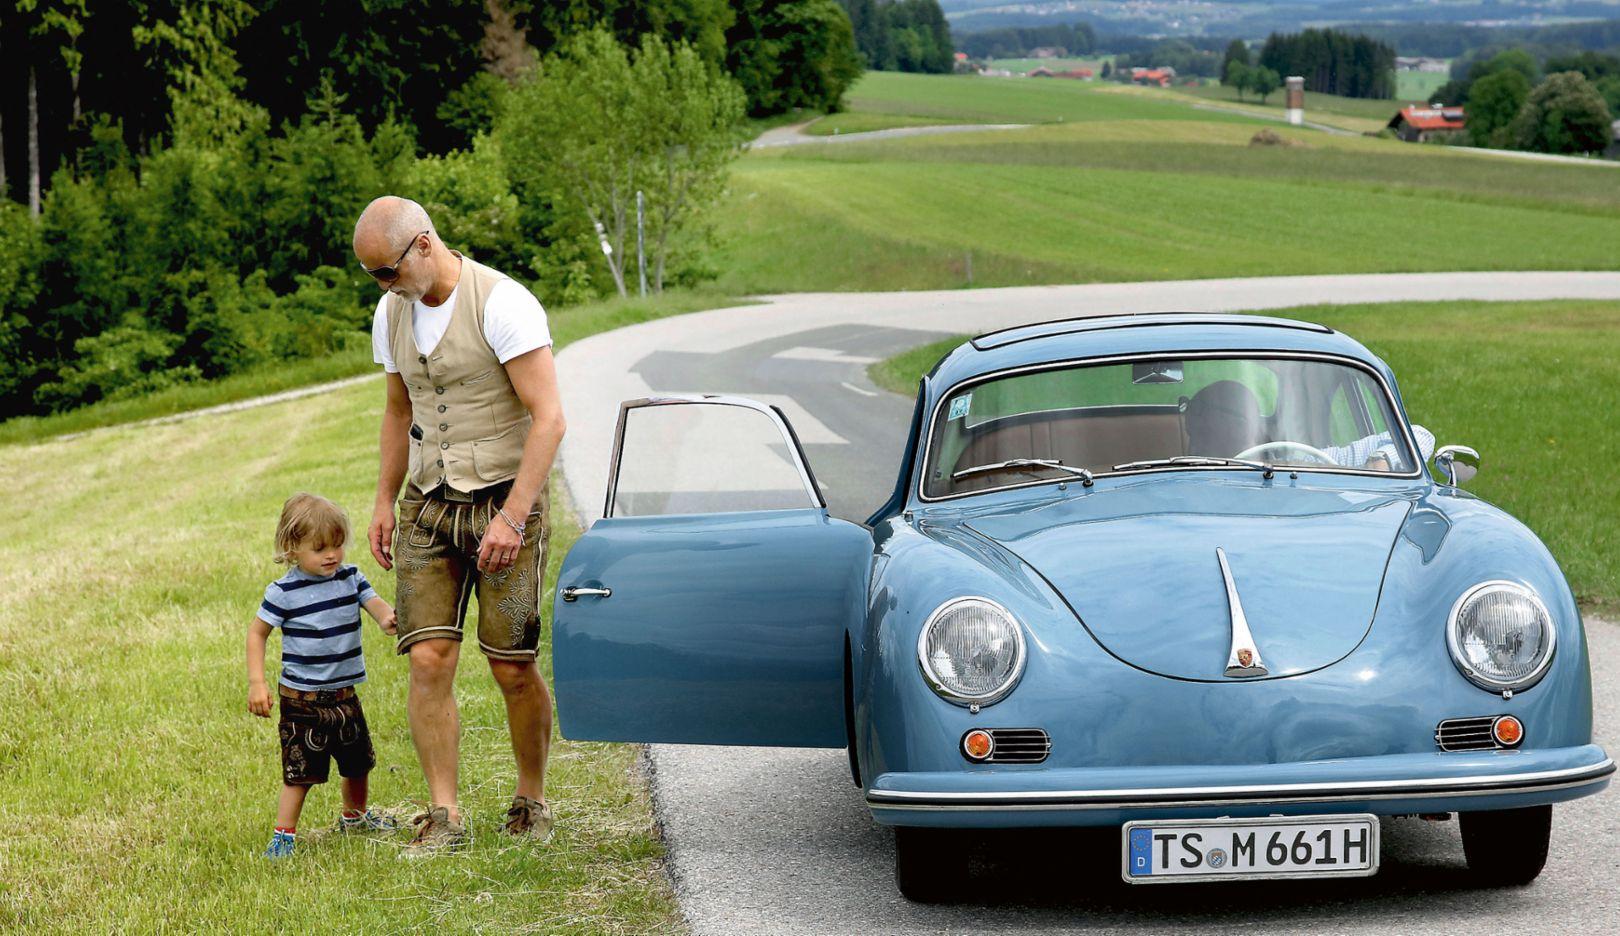 Markus Meindl, Porsche 356 A, 2017, Porsche AG